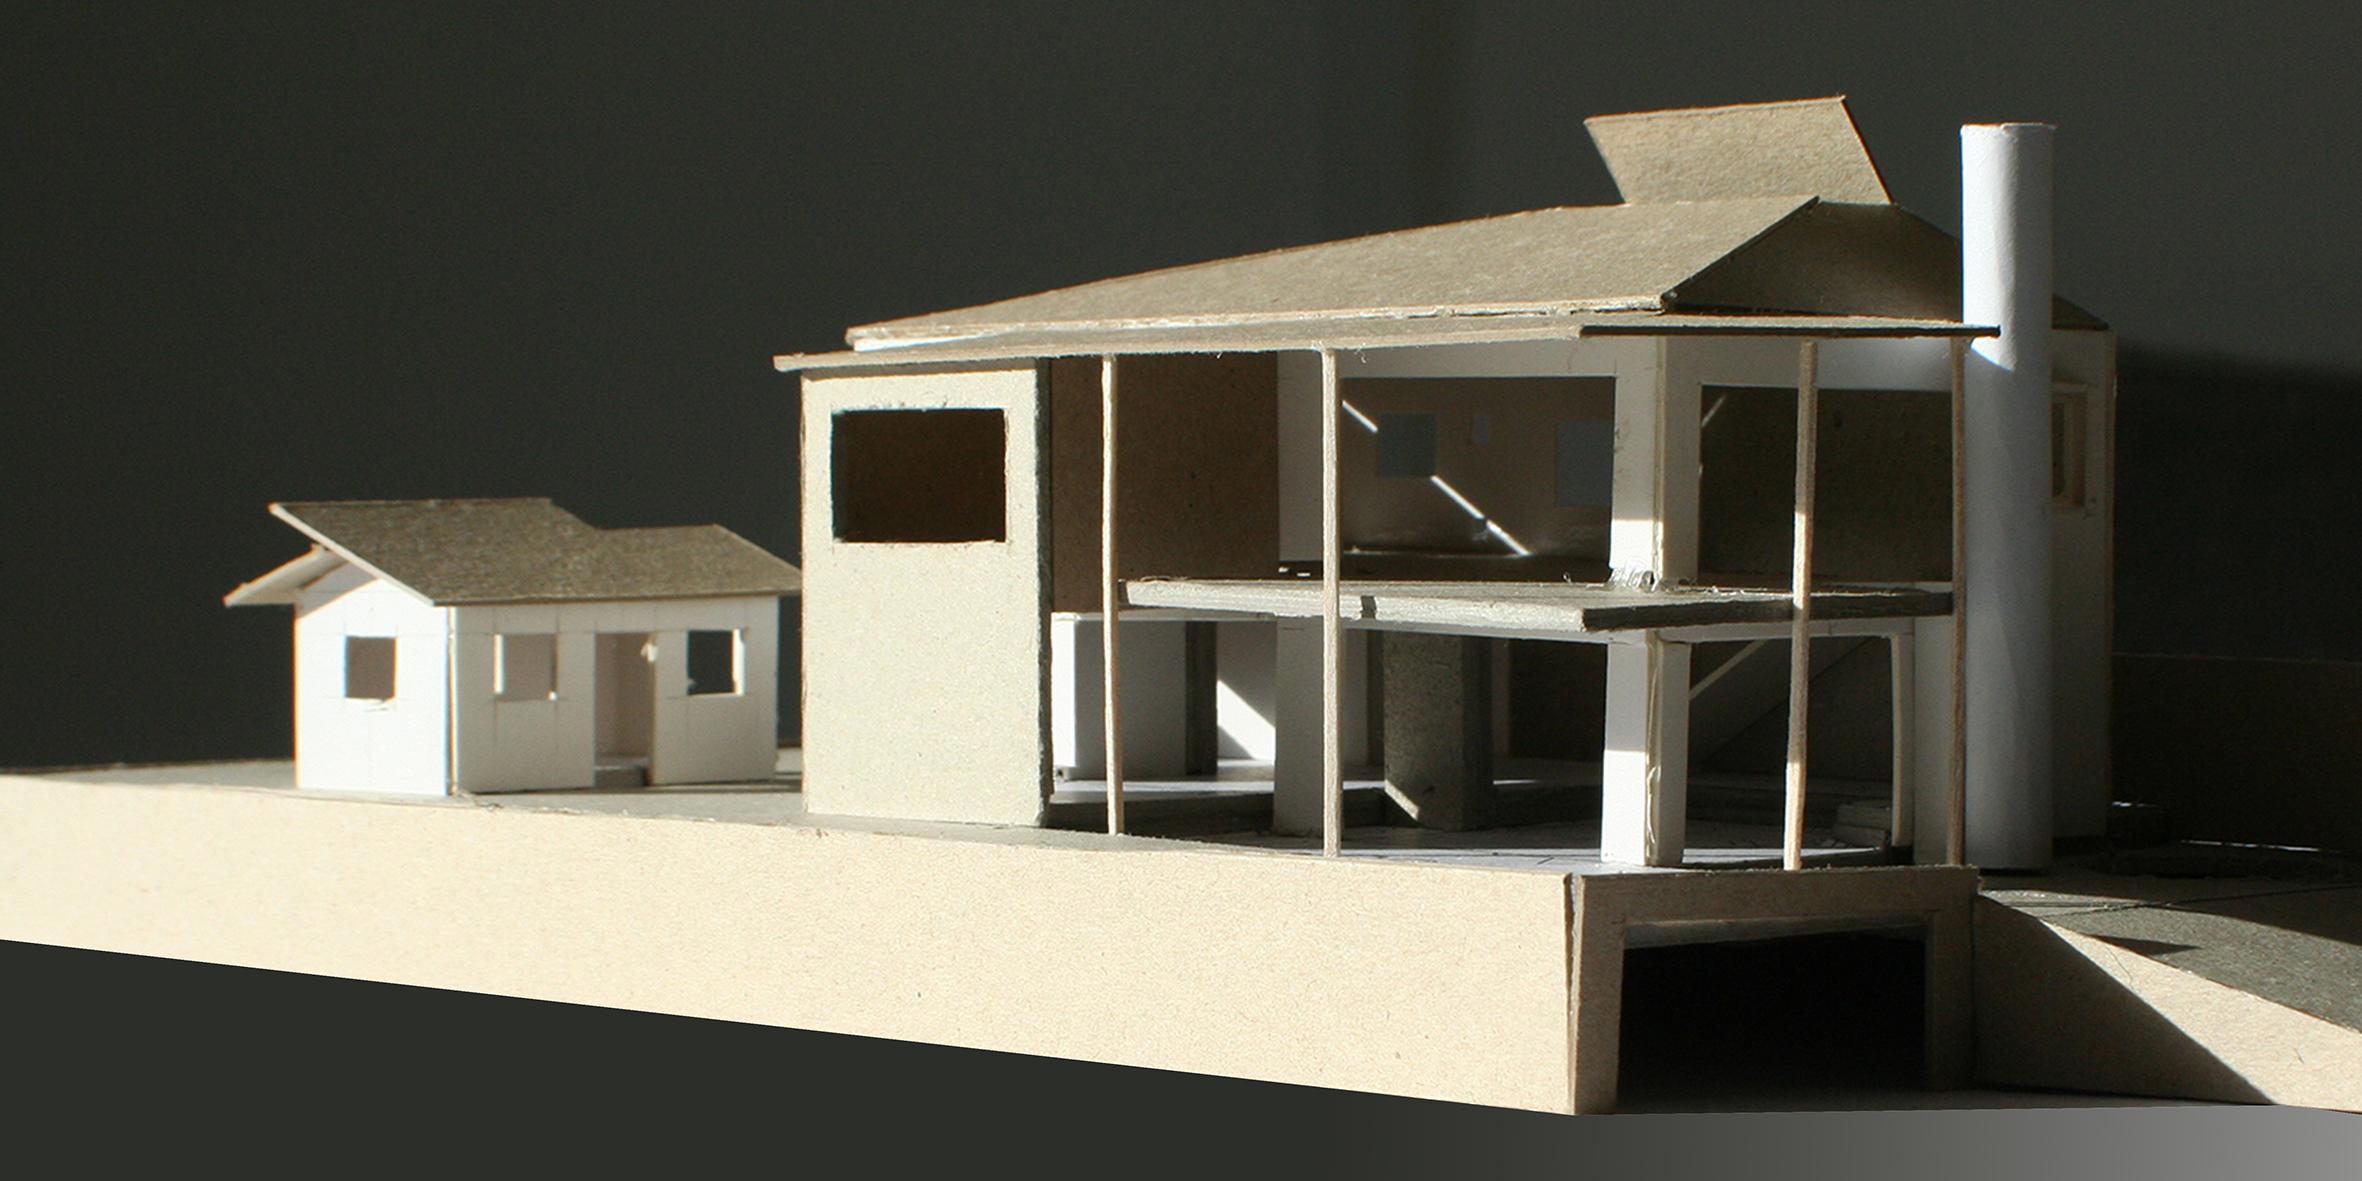 house herles, concept model